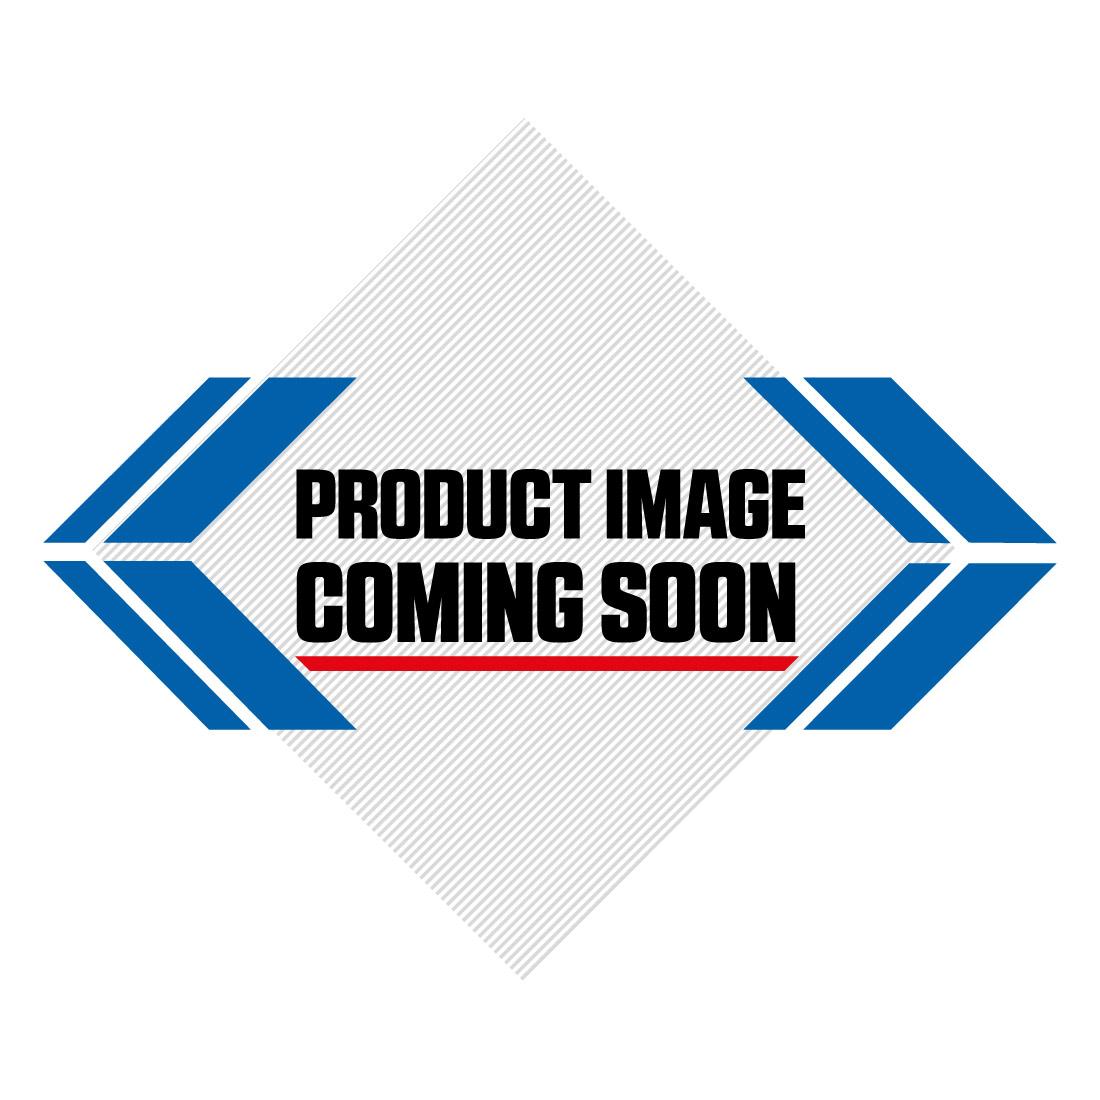 DJI Mavic 2 Pro Drone Image-1